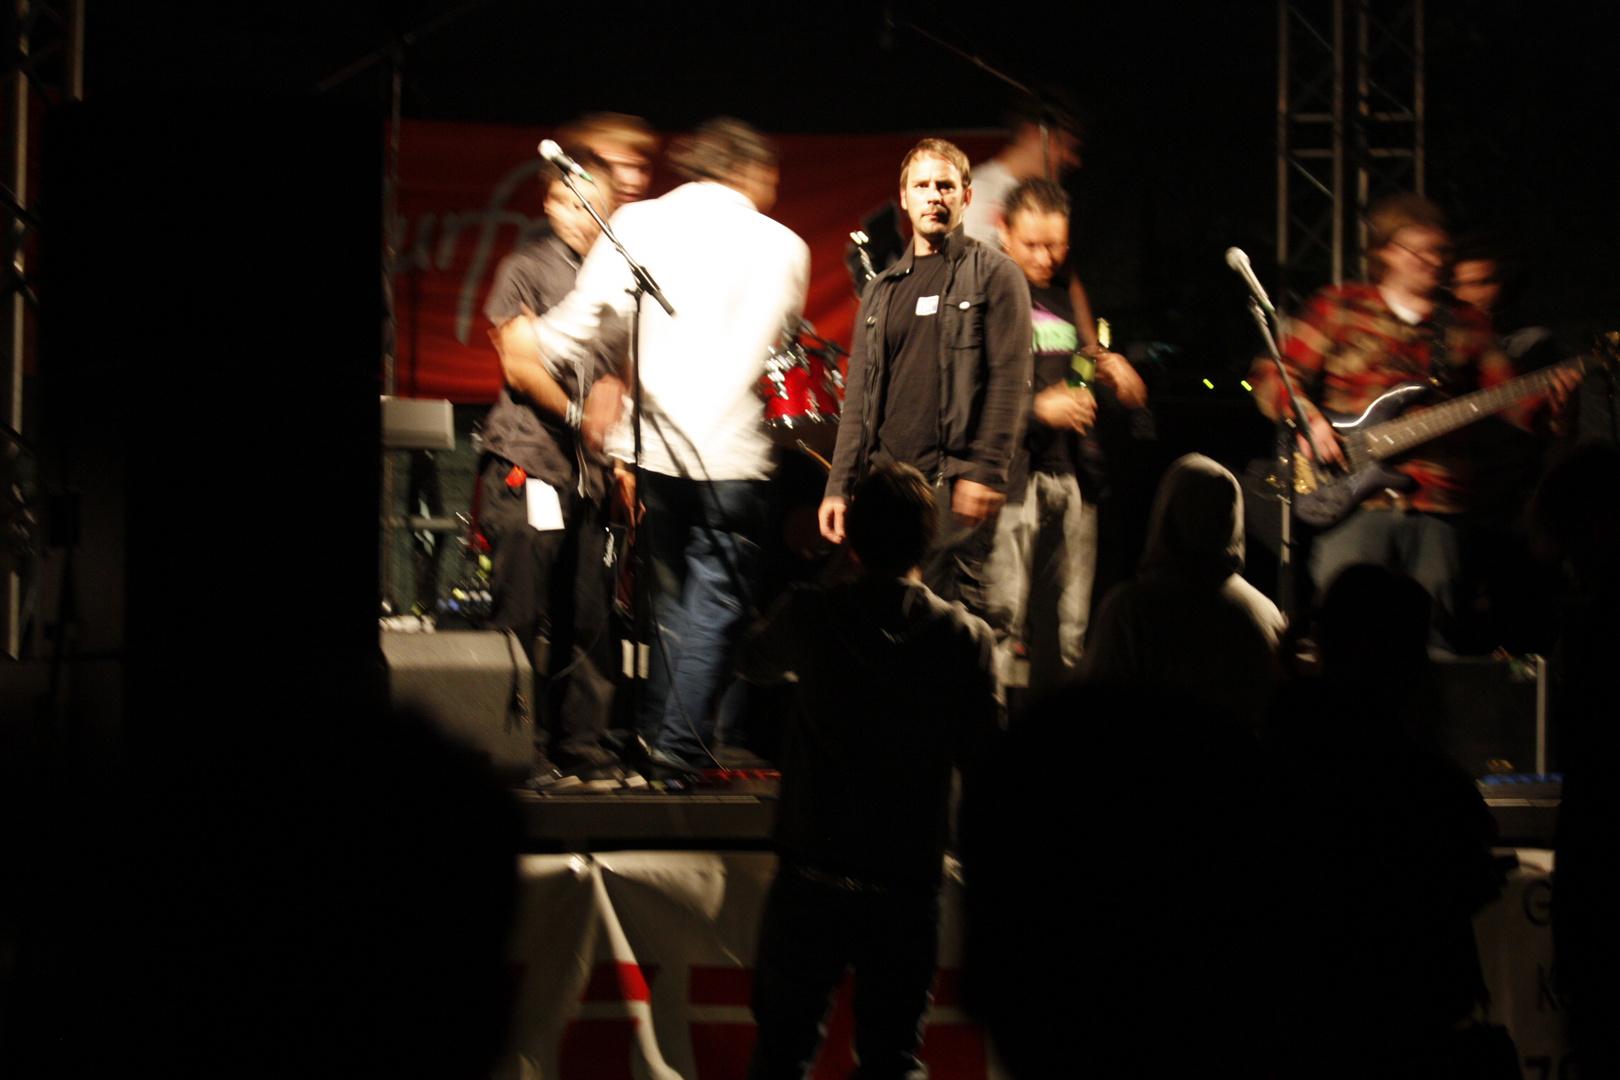 Jugend - Band - Wettbewerb in Oslip